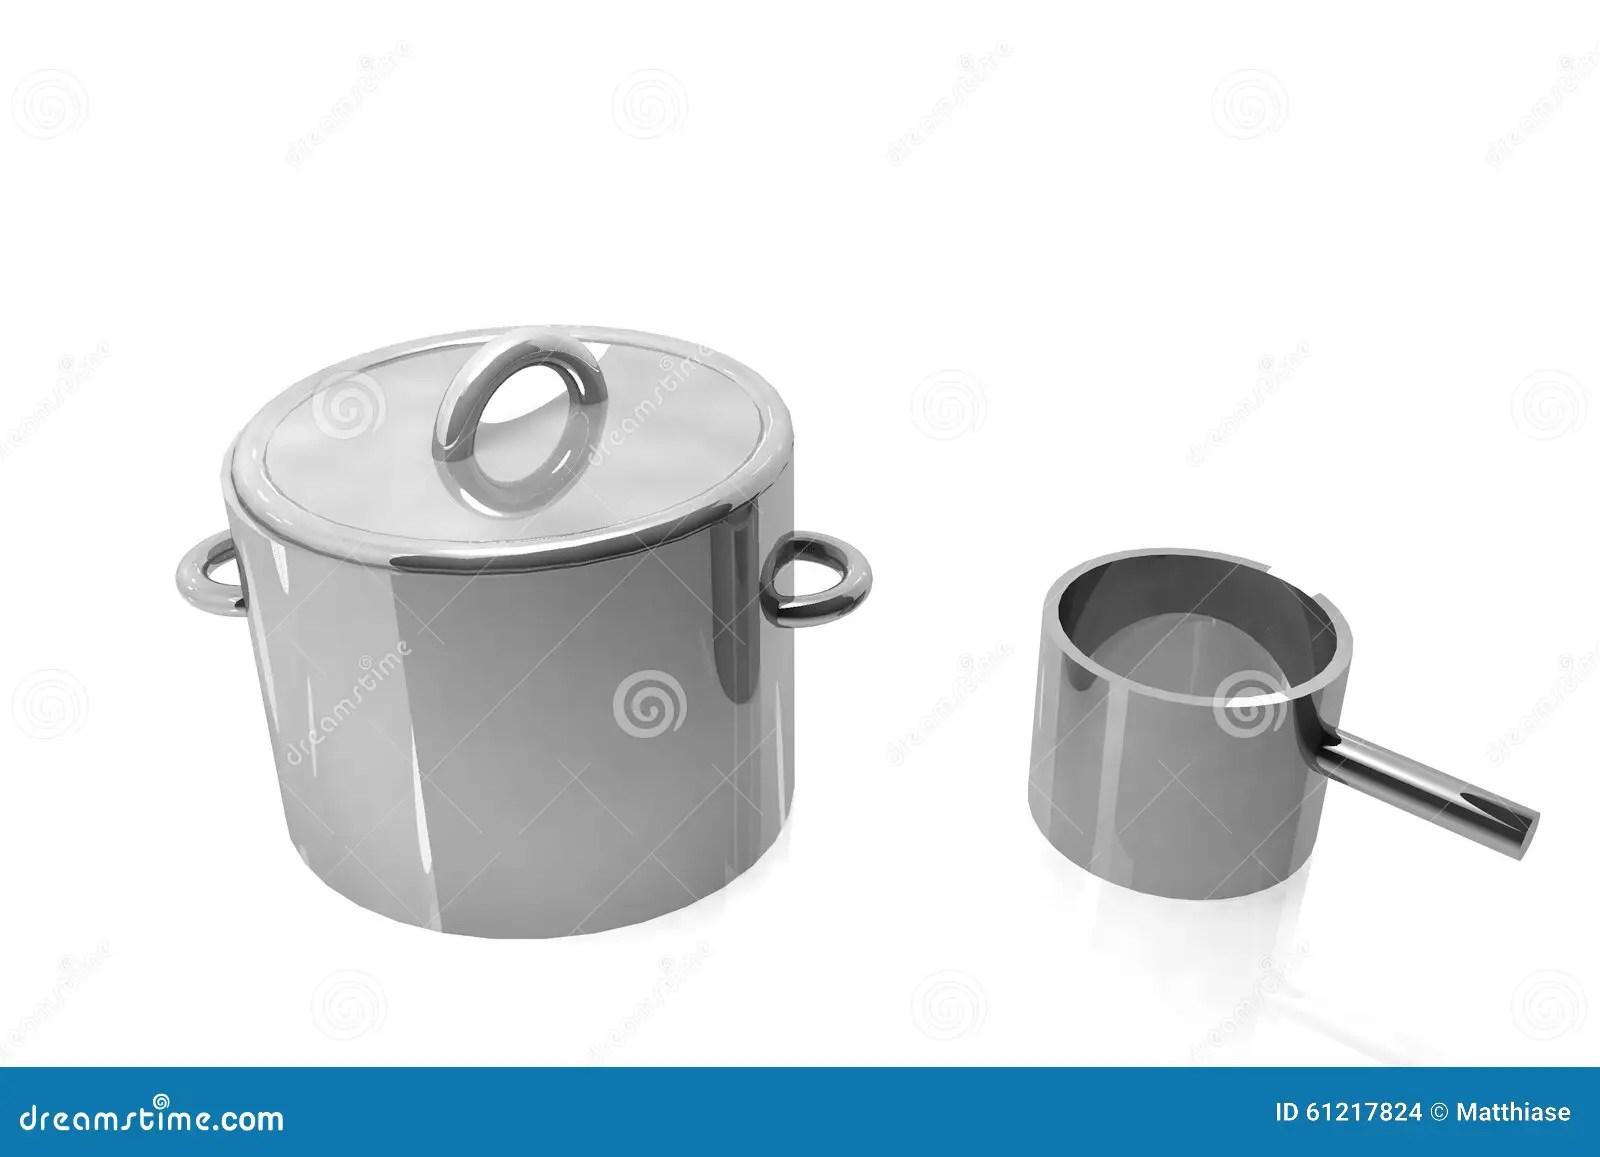 kitchen canister mr direct sinks reviews 厨房罐3d 库存例证 插画包括有厨房 豪华 烹饪器材 空白 厨具 对象